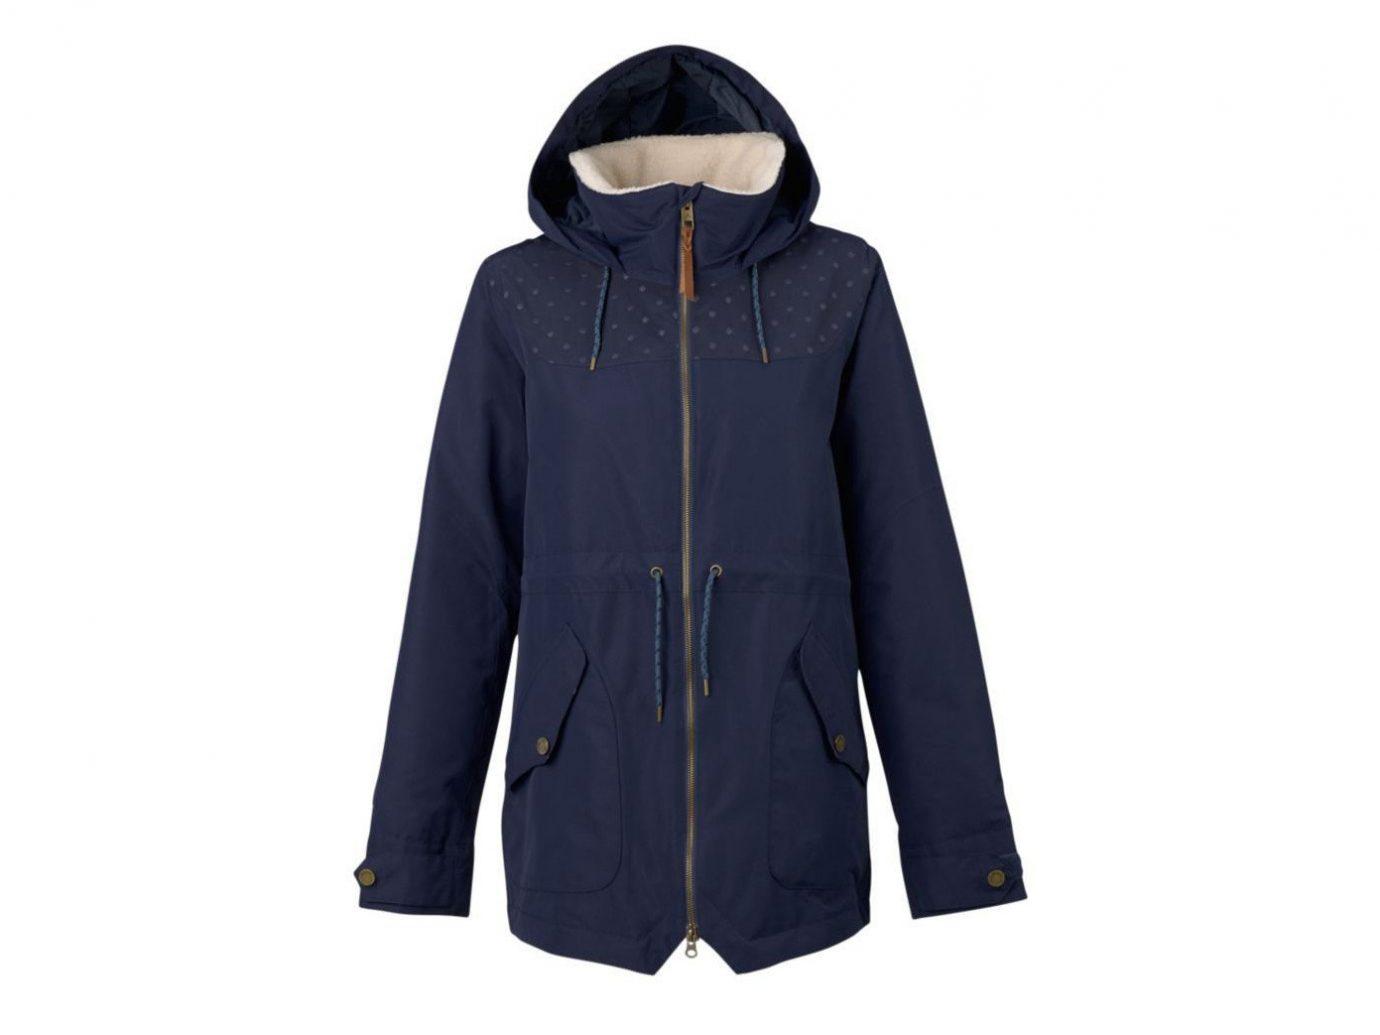 Travel Shop Travel Tips clothing hood person jacket black suit wearing hoodie product coat sweatshirt polar fleece posing electric blue sleeve dressed